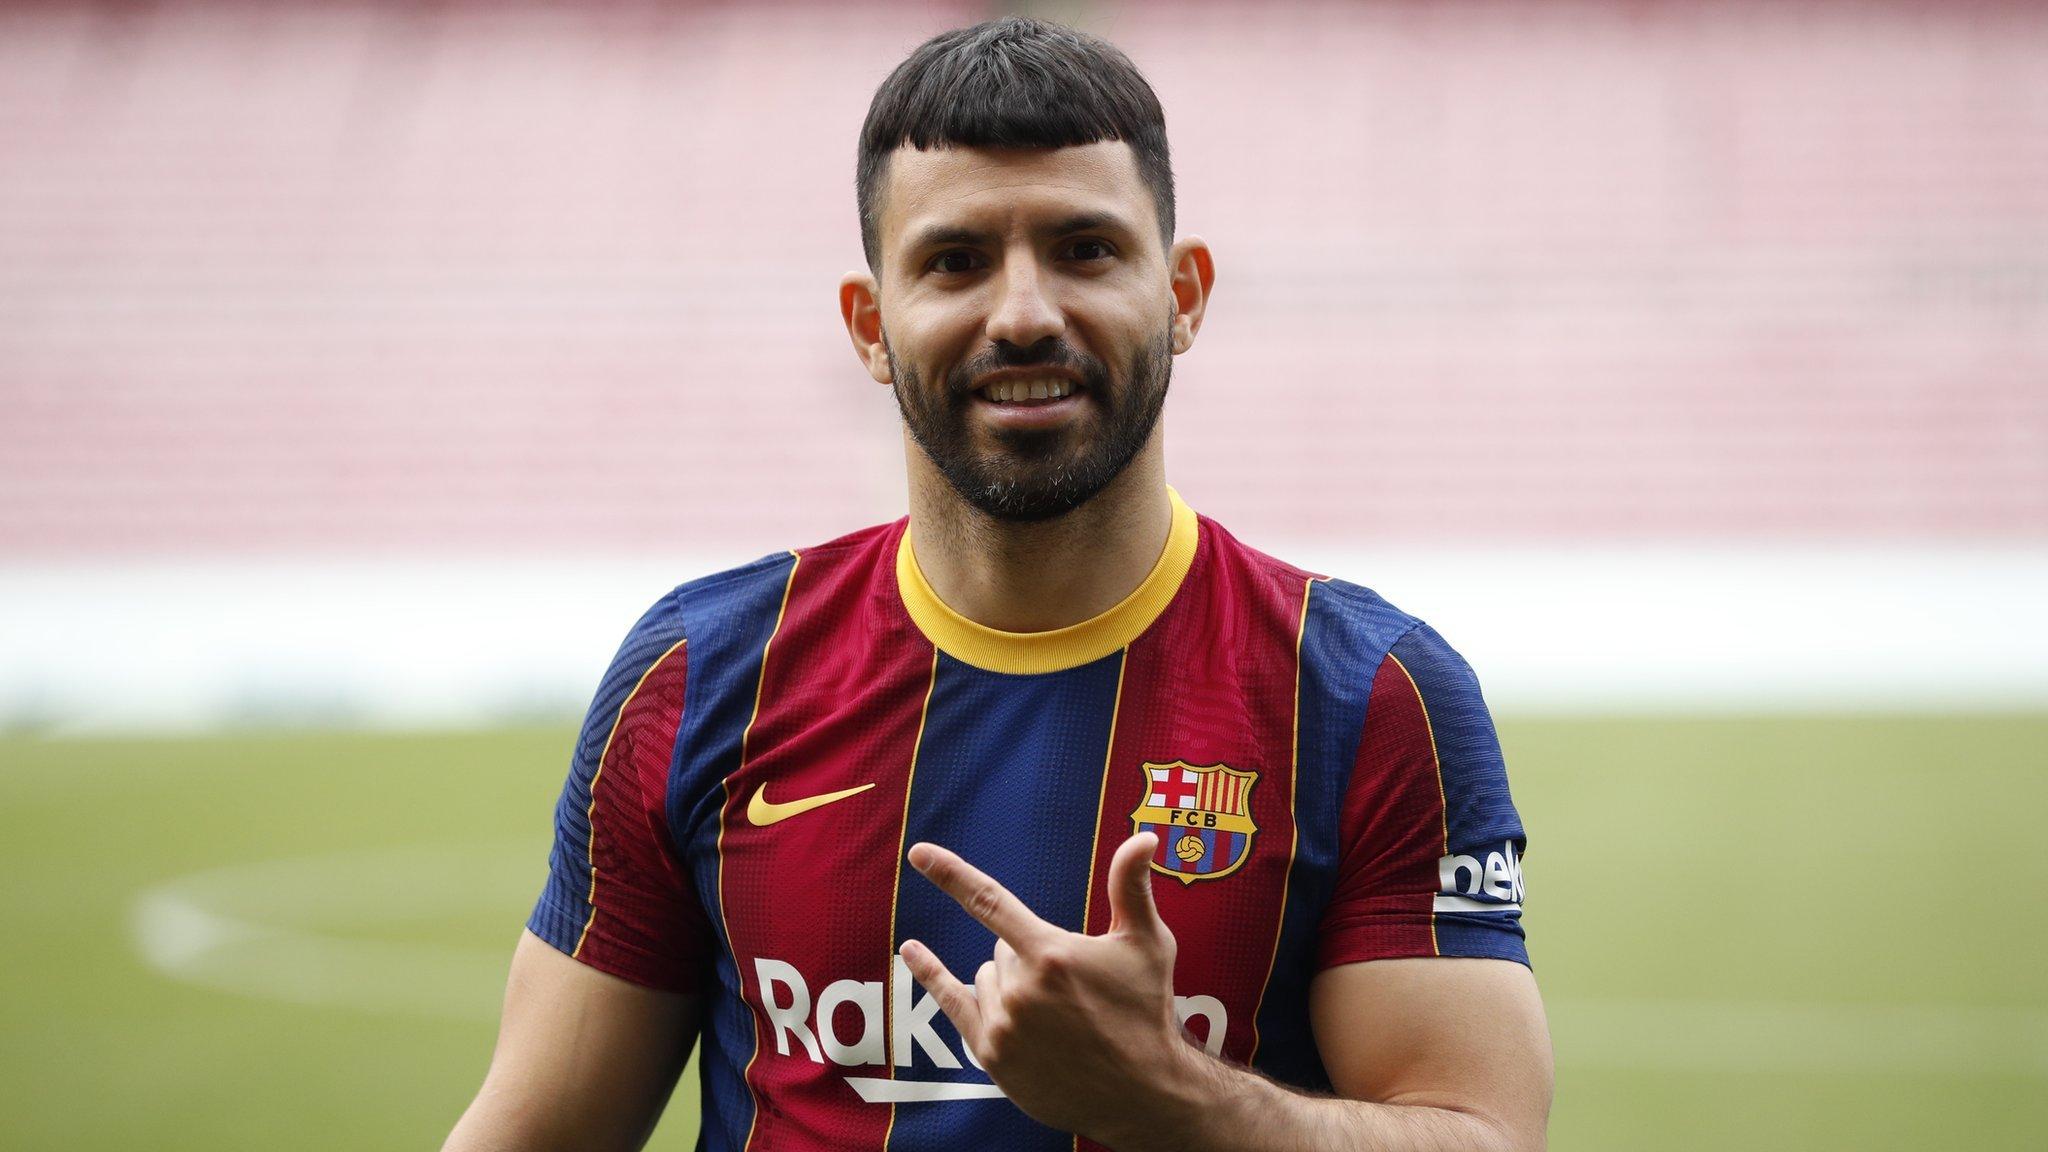 Sergio Aguero Barcelona Igiye Kugura Uyu Rutahizamu Wa Man City Bbc News Gahuza